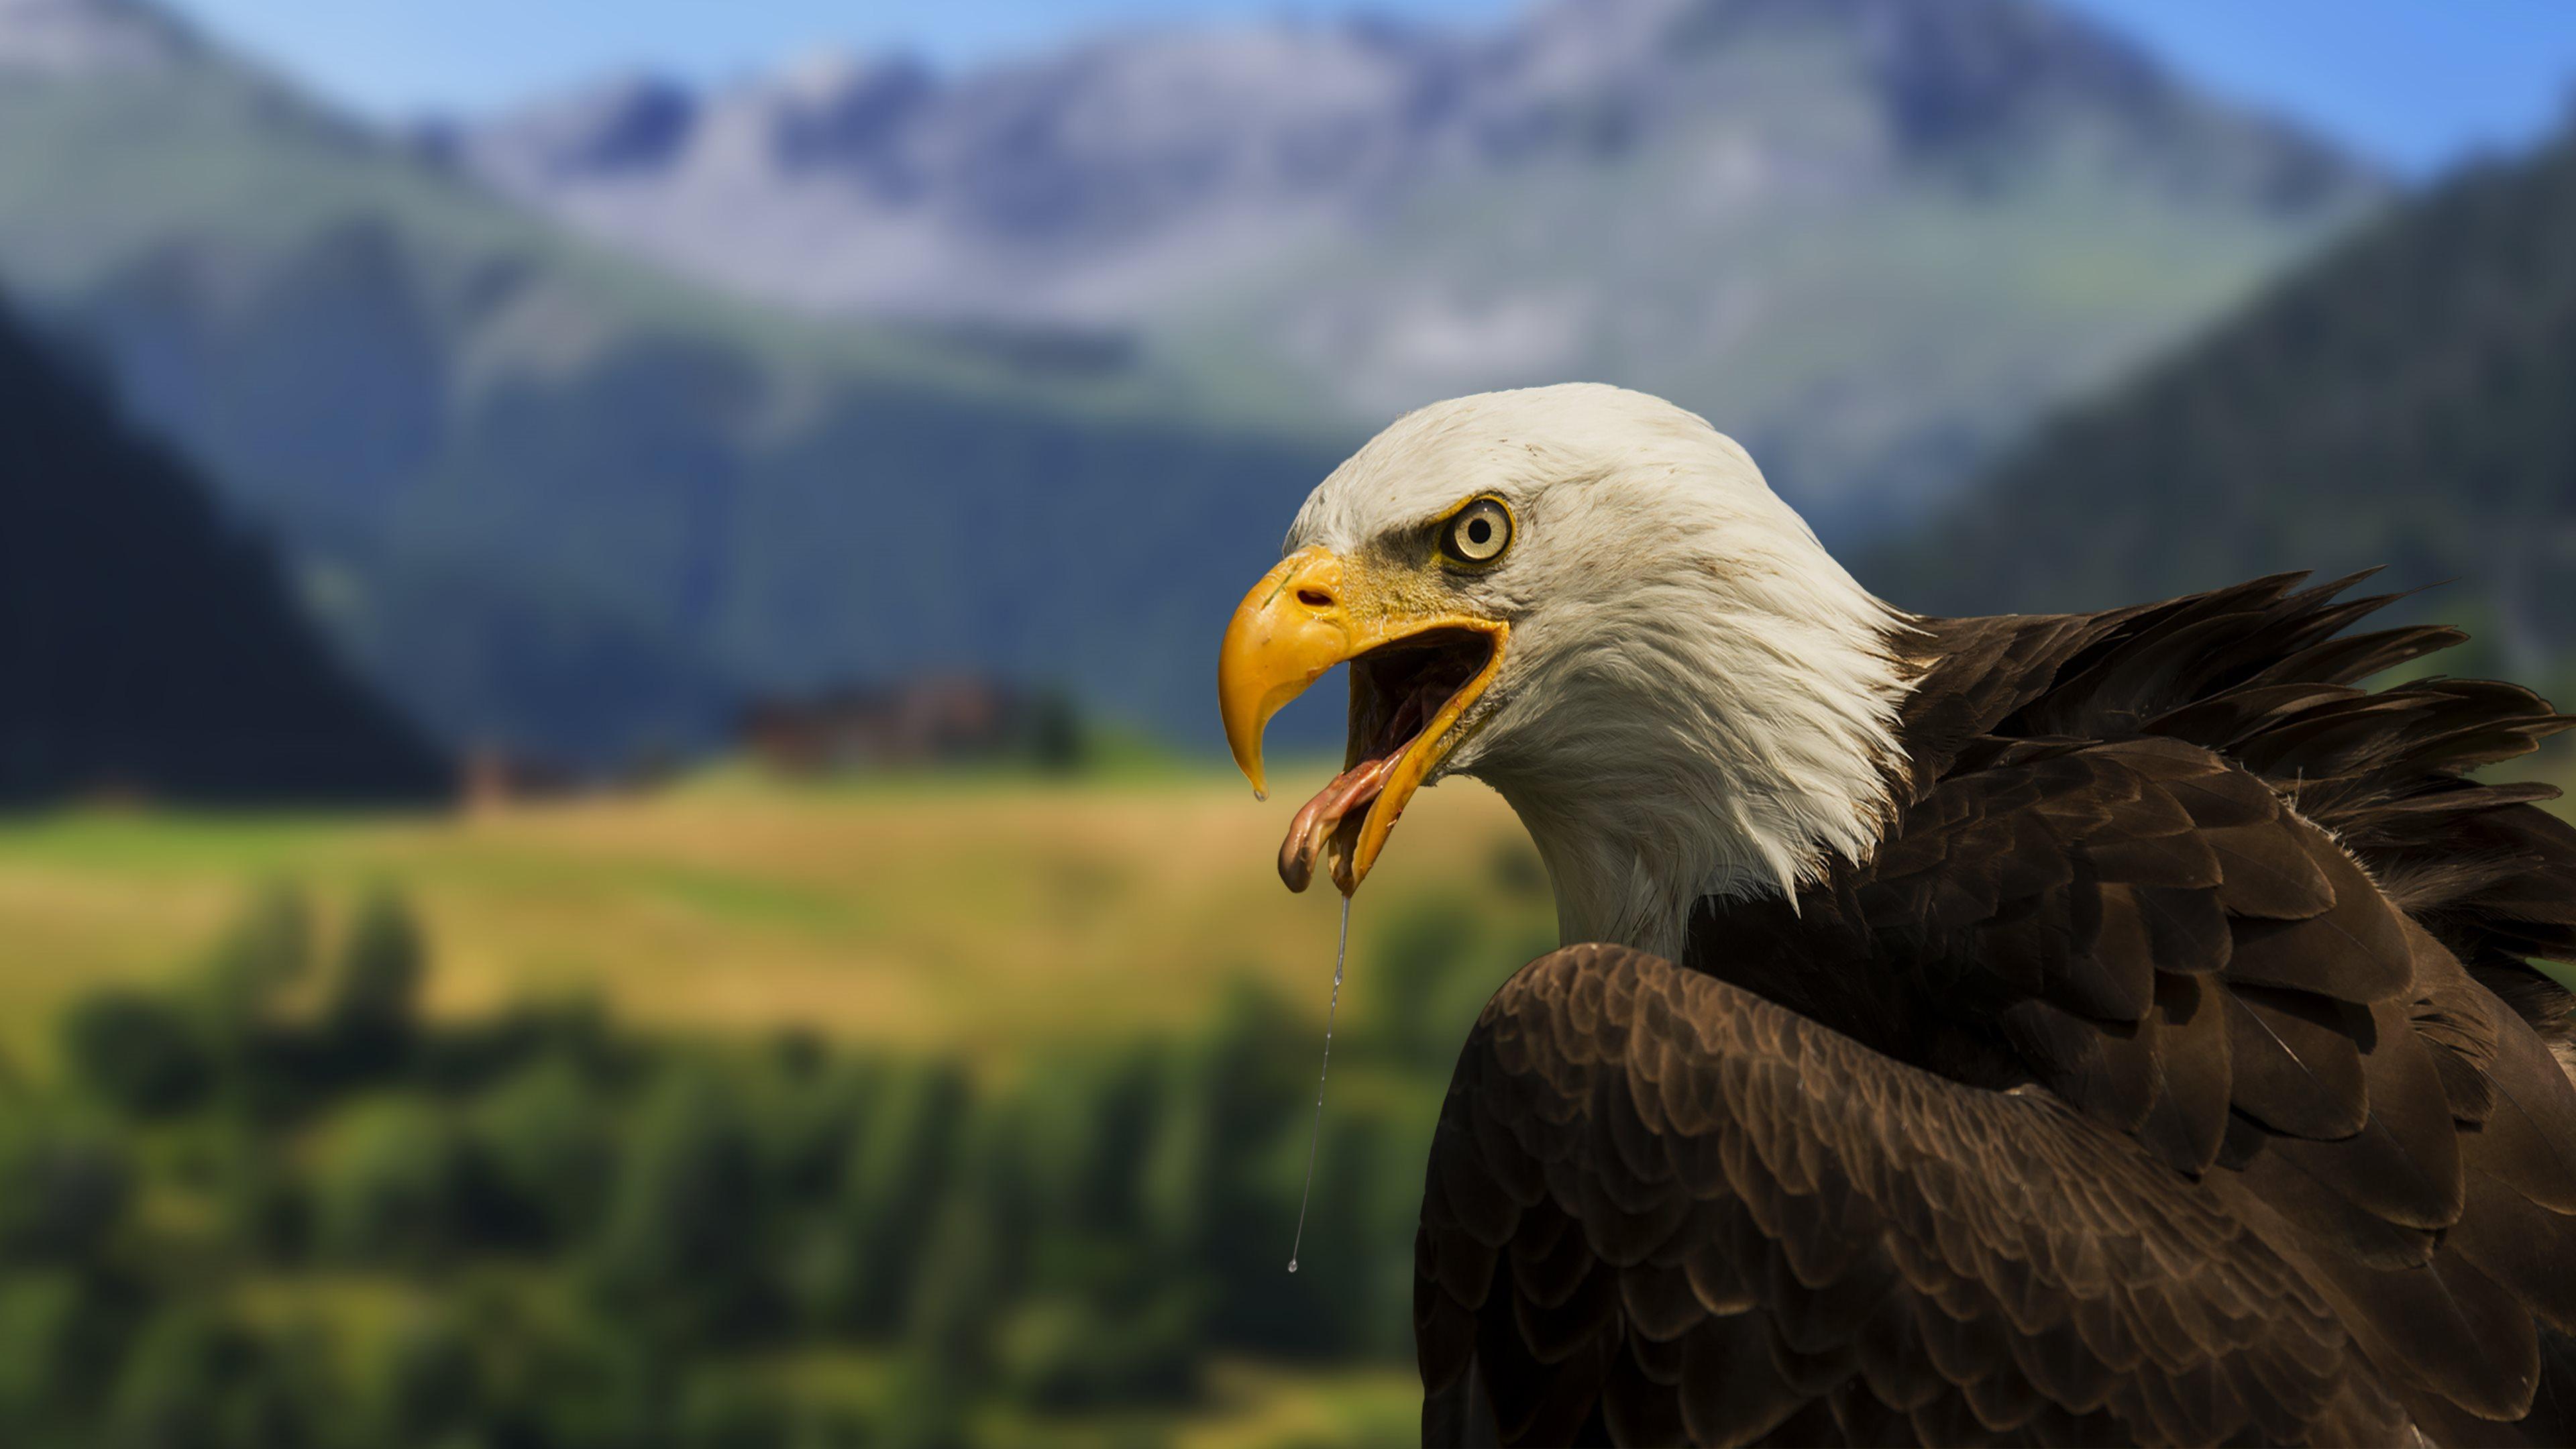 Free download Bald Eagle 4K Wallpaper Full 1080p Ultra HD ...